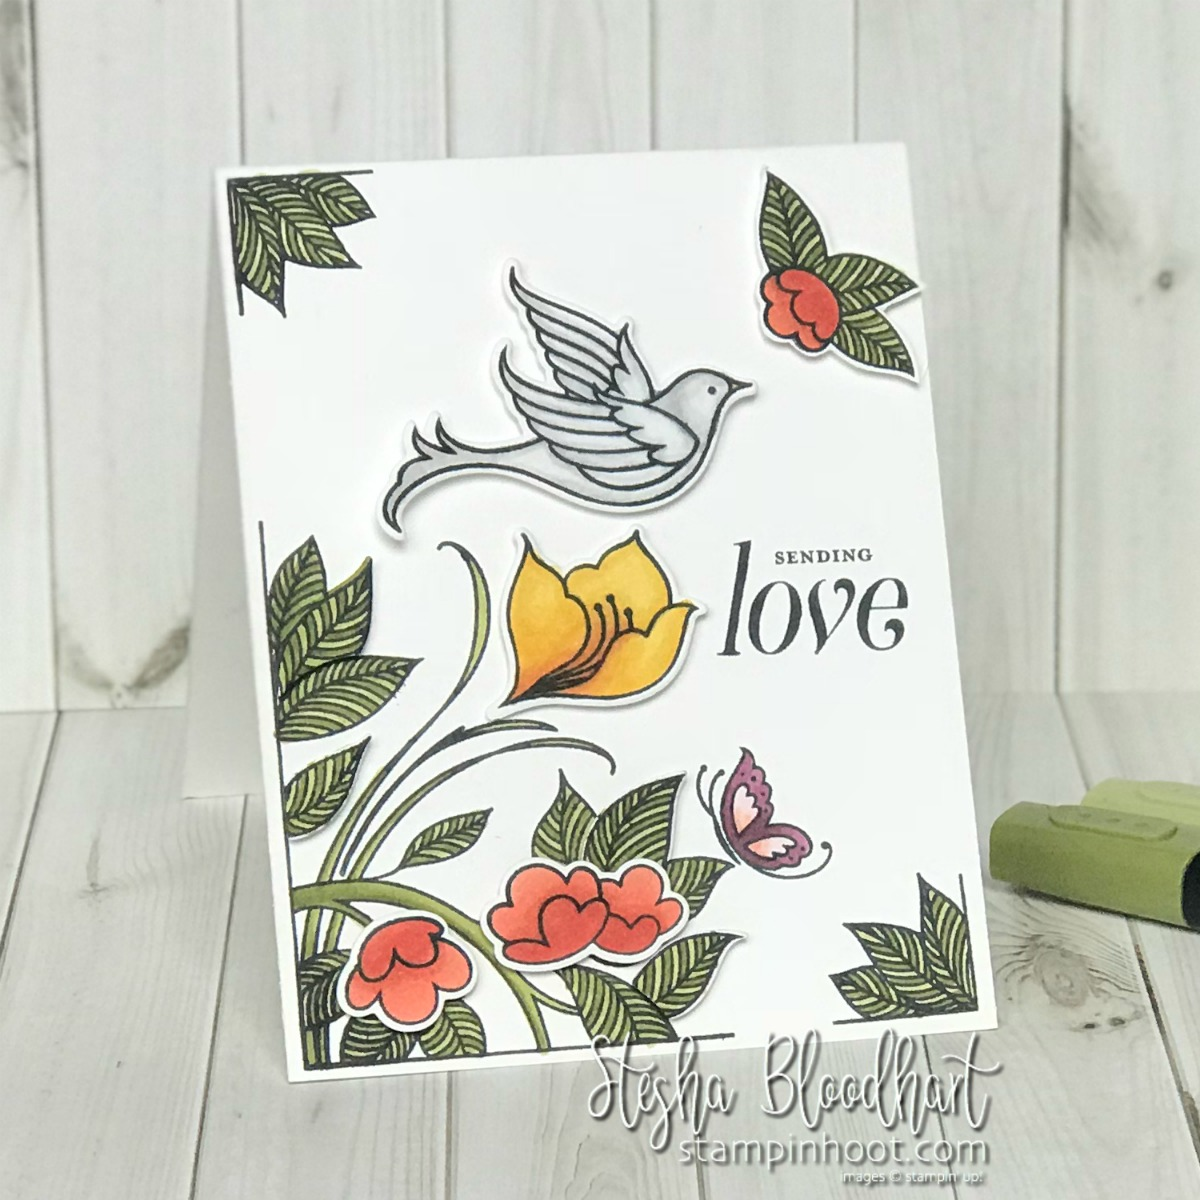 Serene Garden Bundle by Stampin' Up! Handmade Sympathy Card by Stesha Bloodhart, Stampin' Hoot! #steshabloodhart #stampinhoot